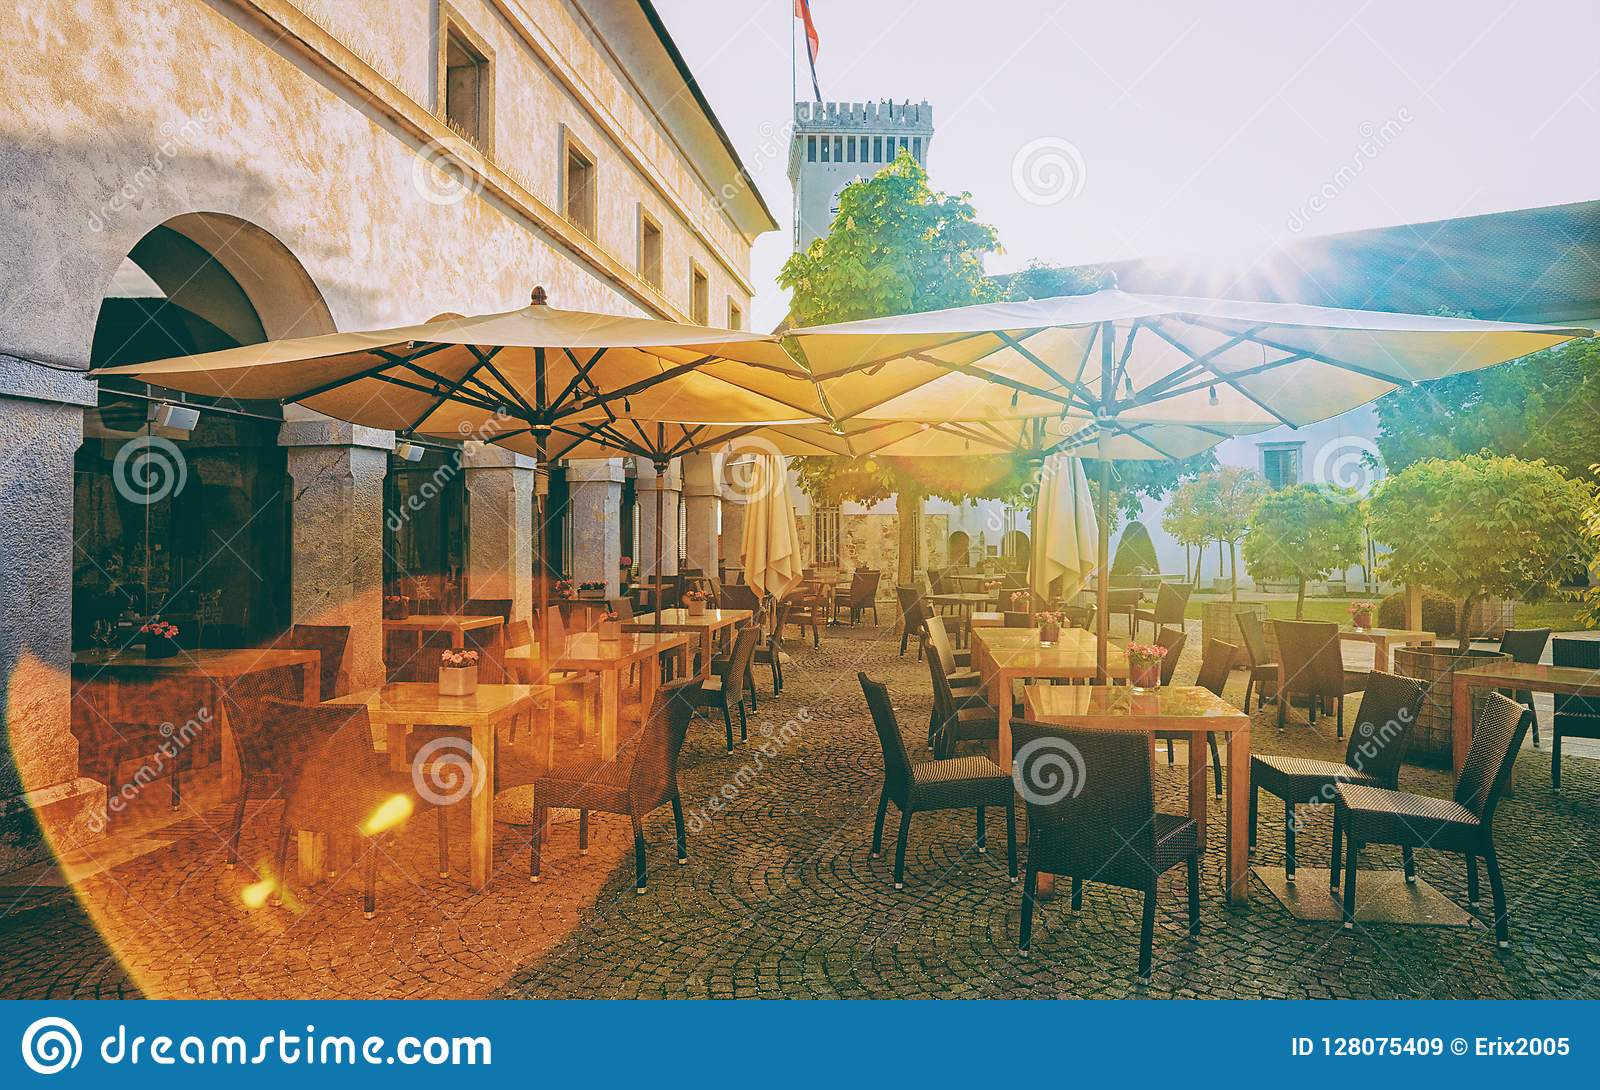 Courtyard at Old castle in historical center Ljubljana Slovenia